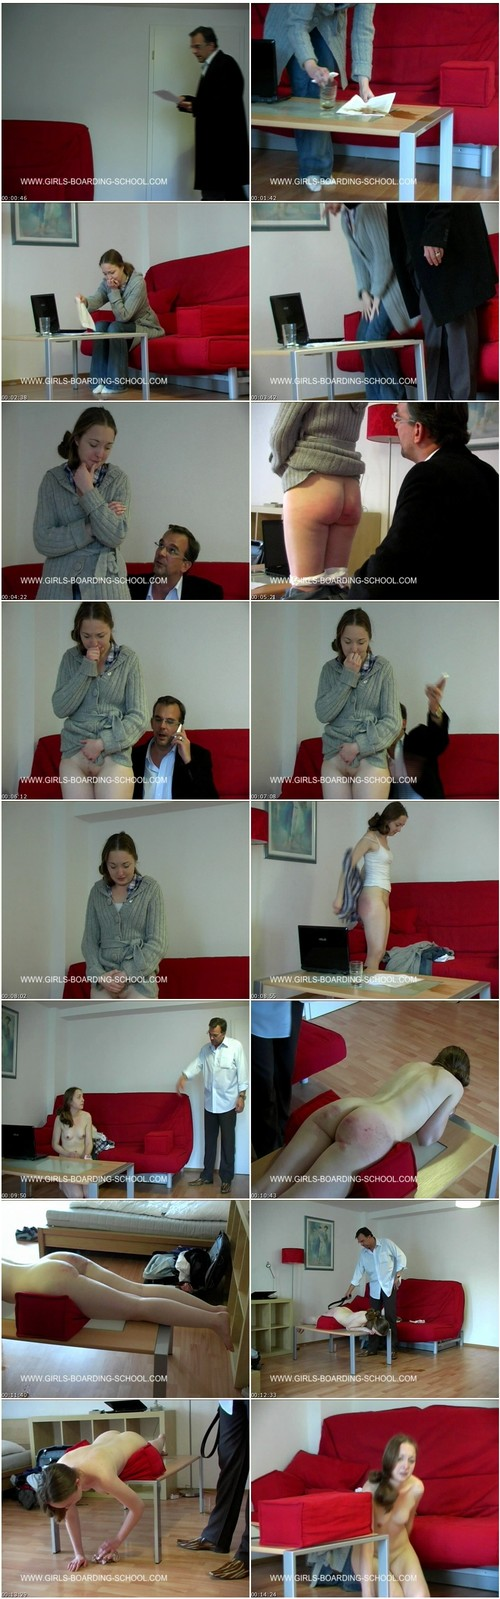 spanking036_thumb_m.jpg